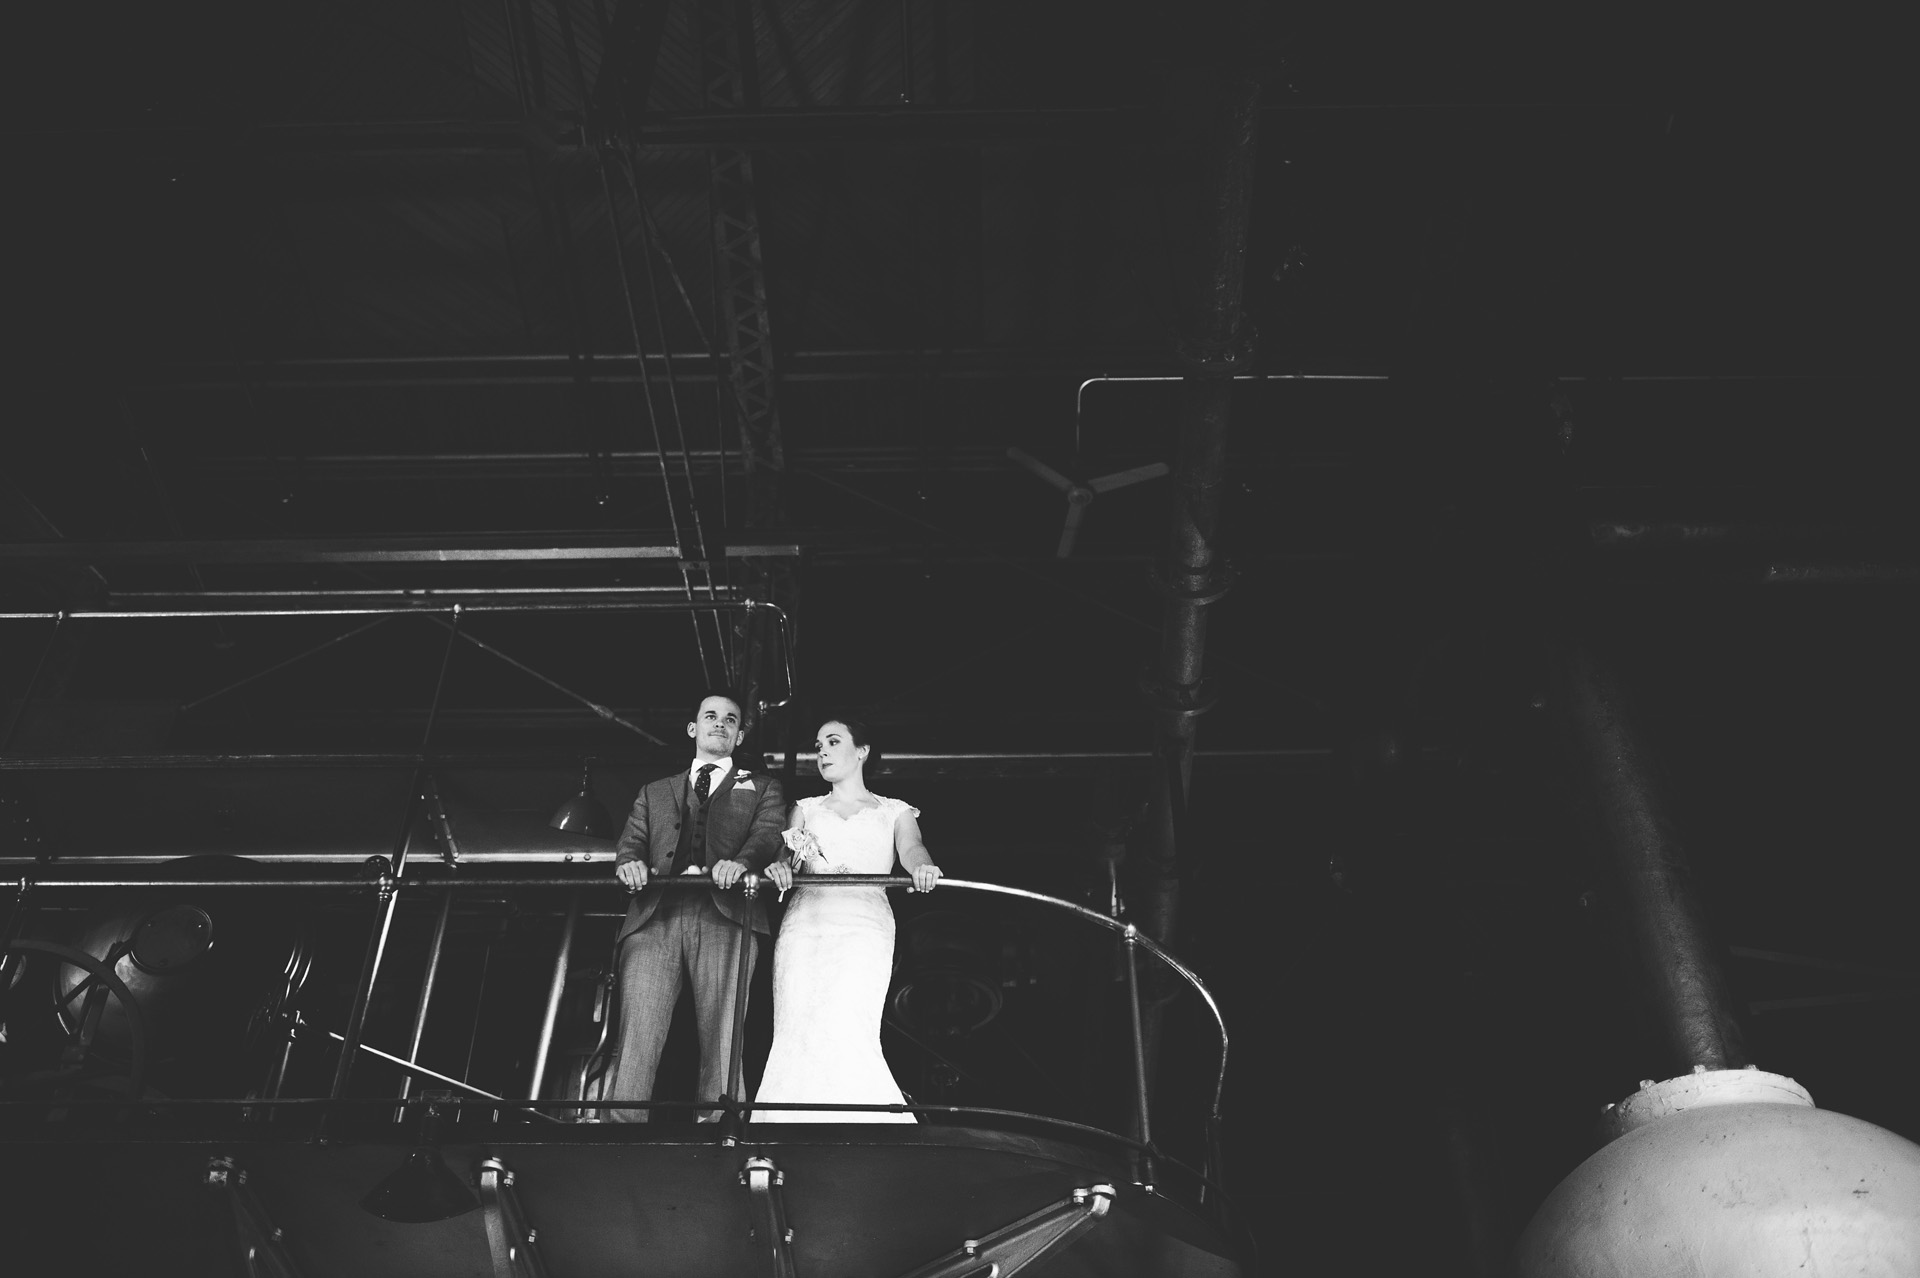 boston-waterworks-museum-wedding-233